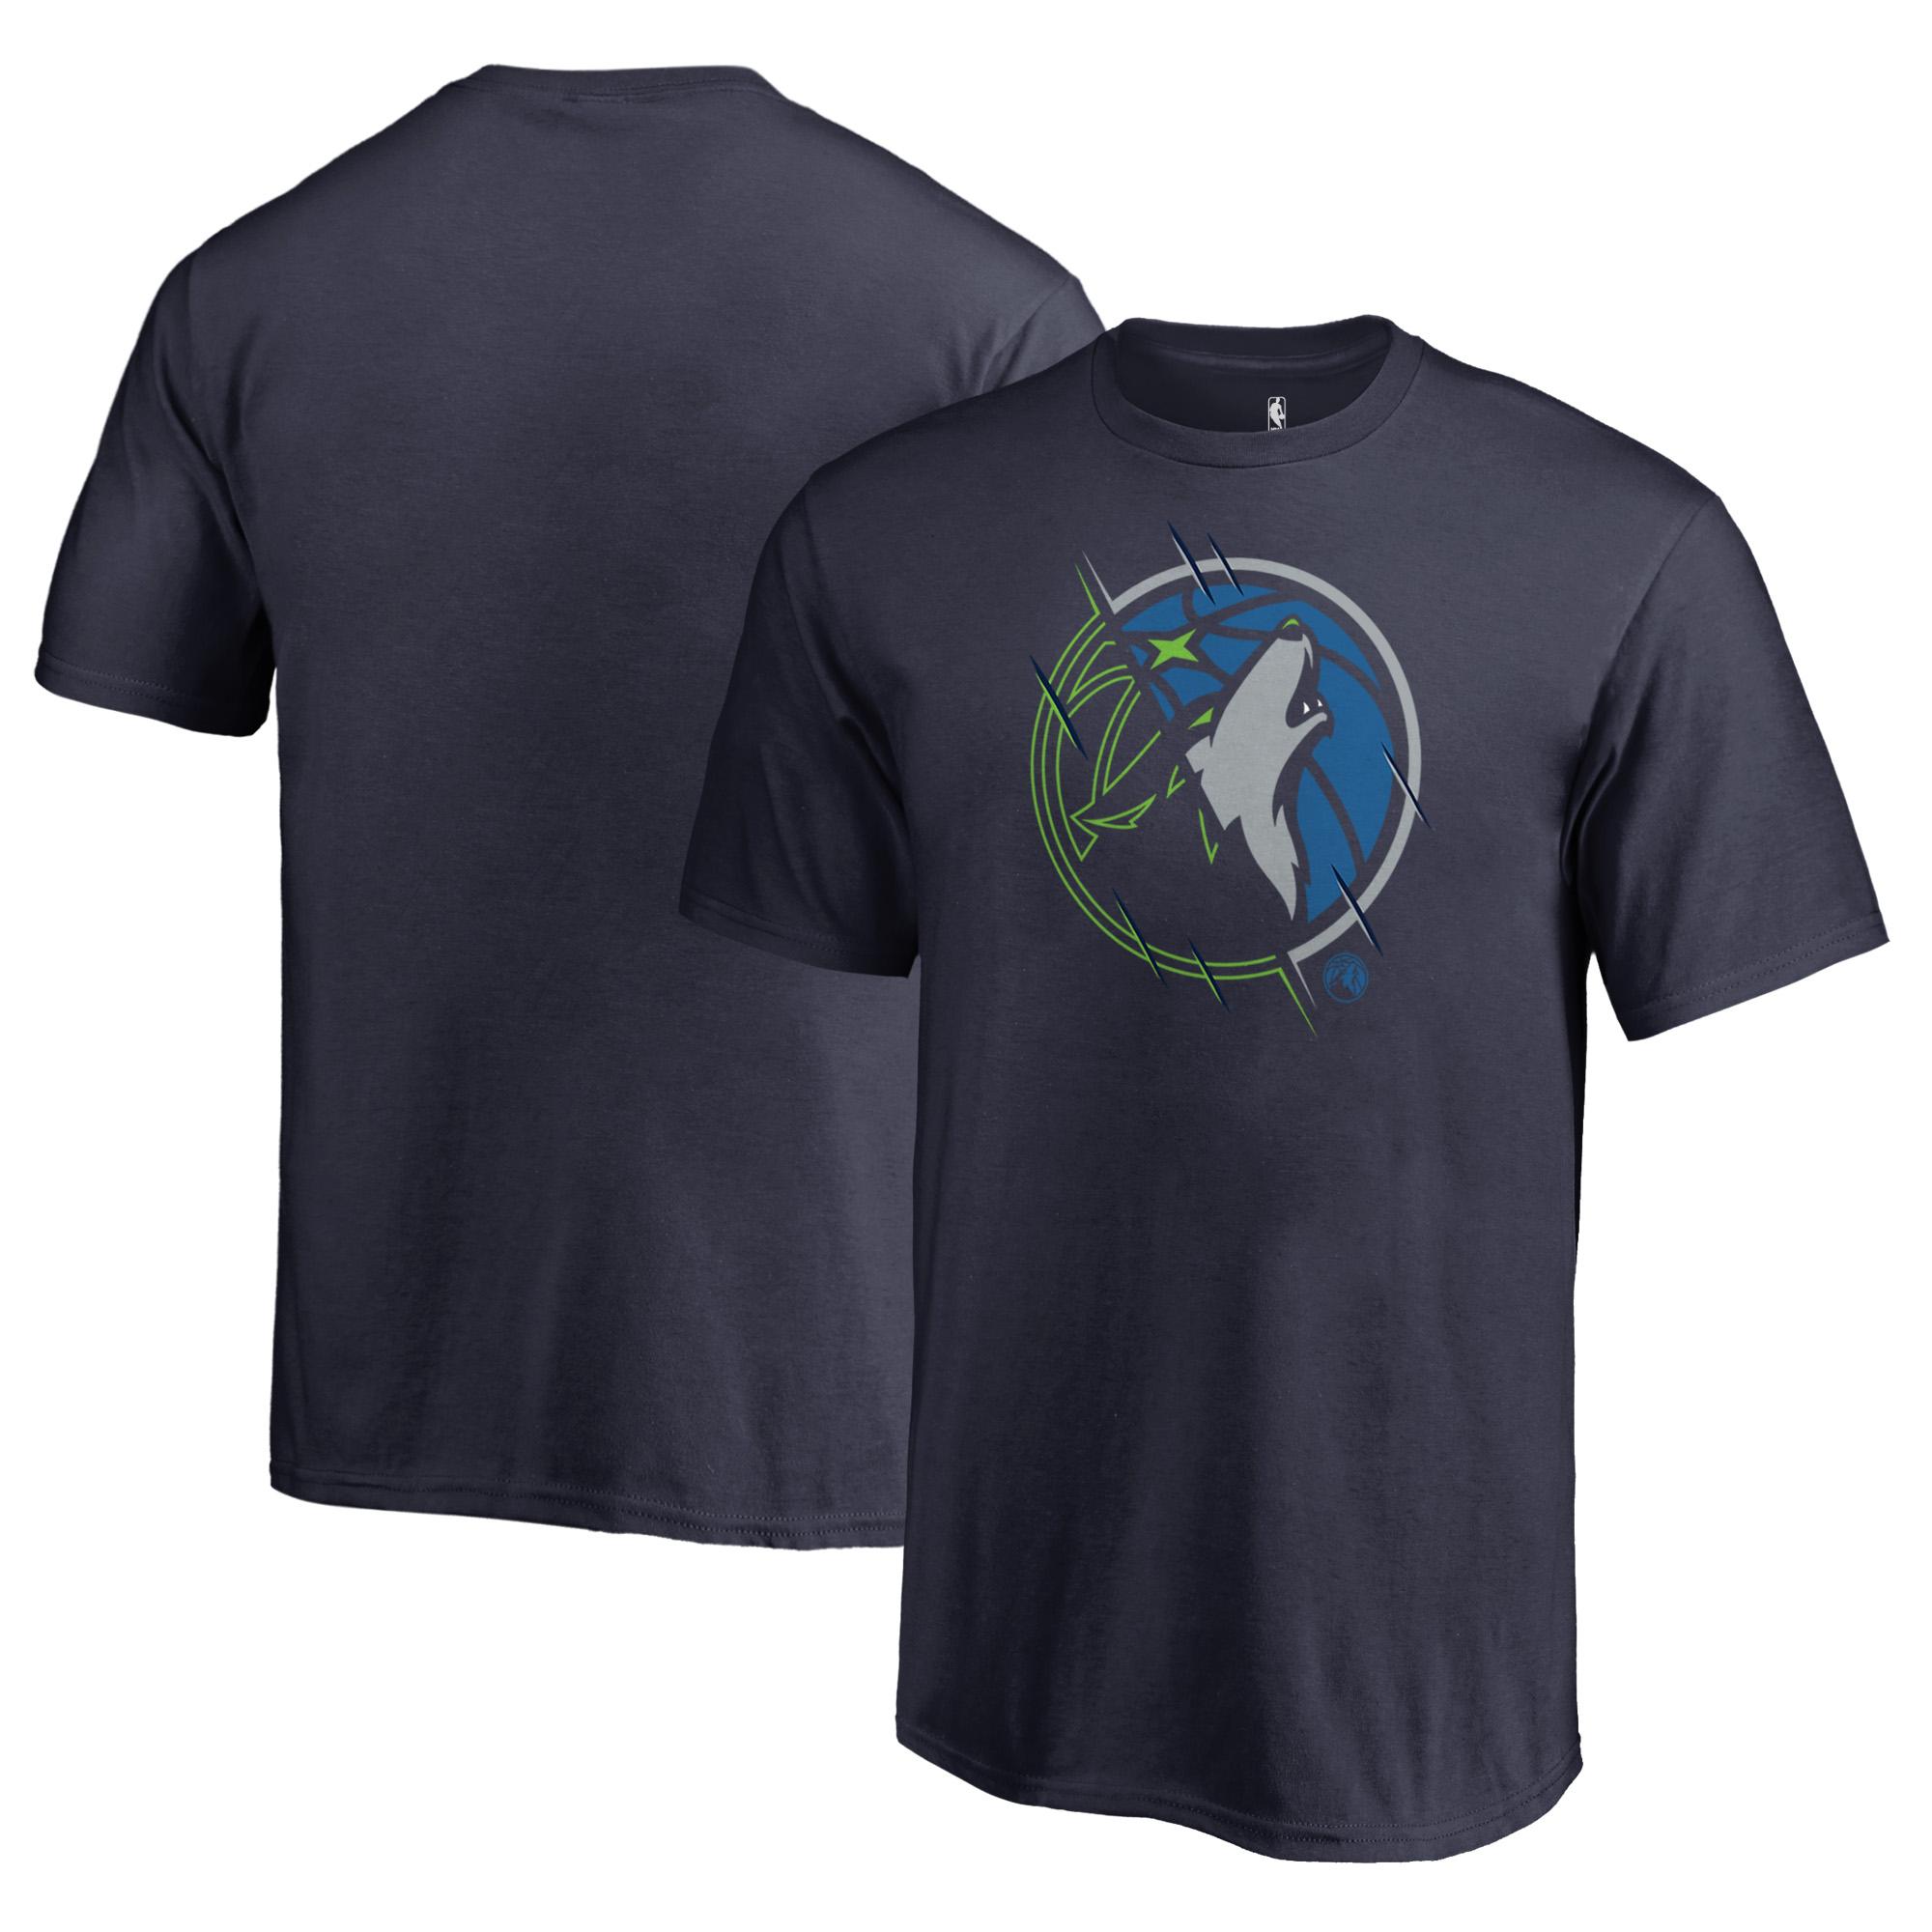 Minnesota Timberwolves Fanatics Branded Youth X-Ray T-Shirt - Navy